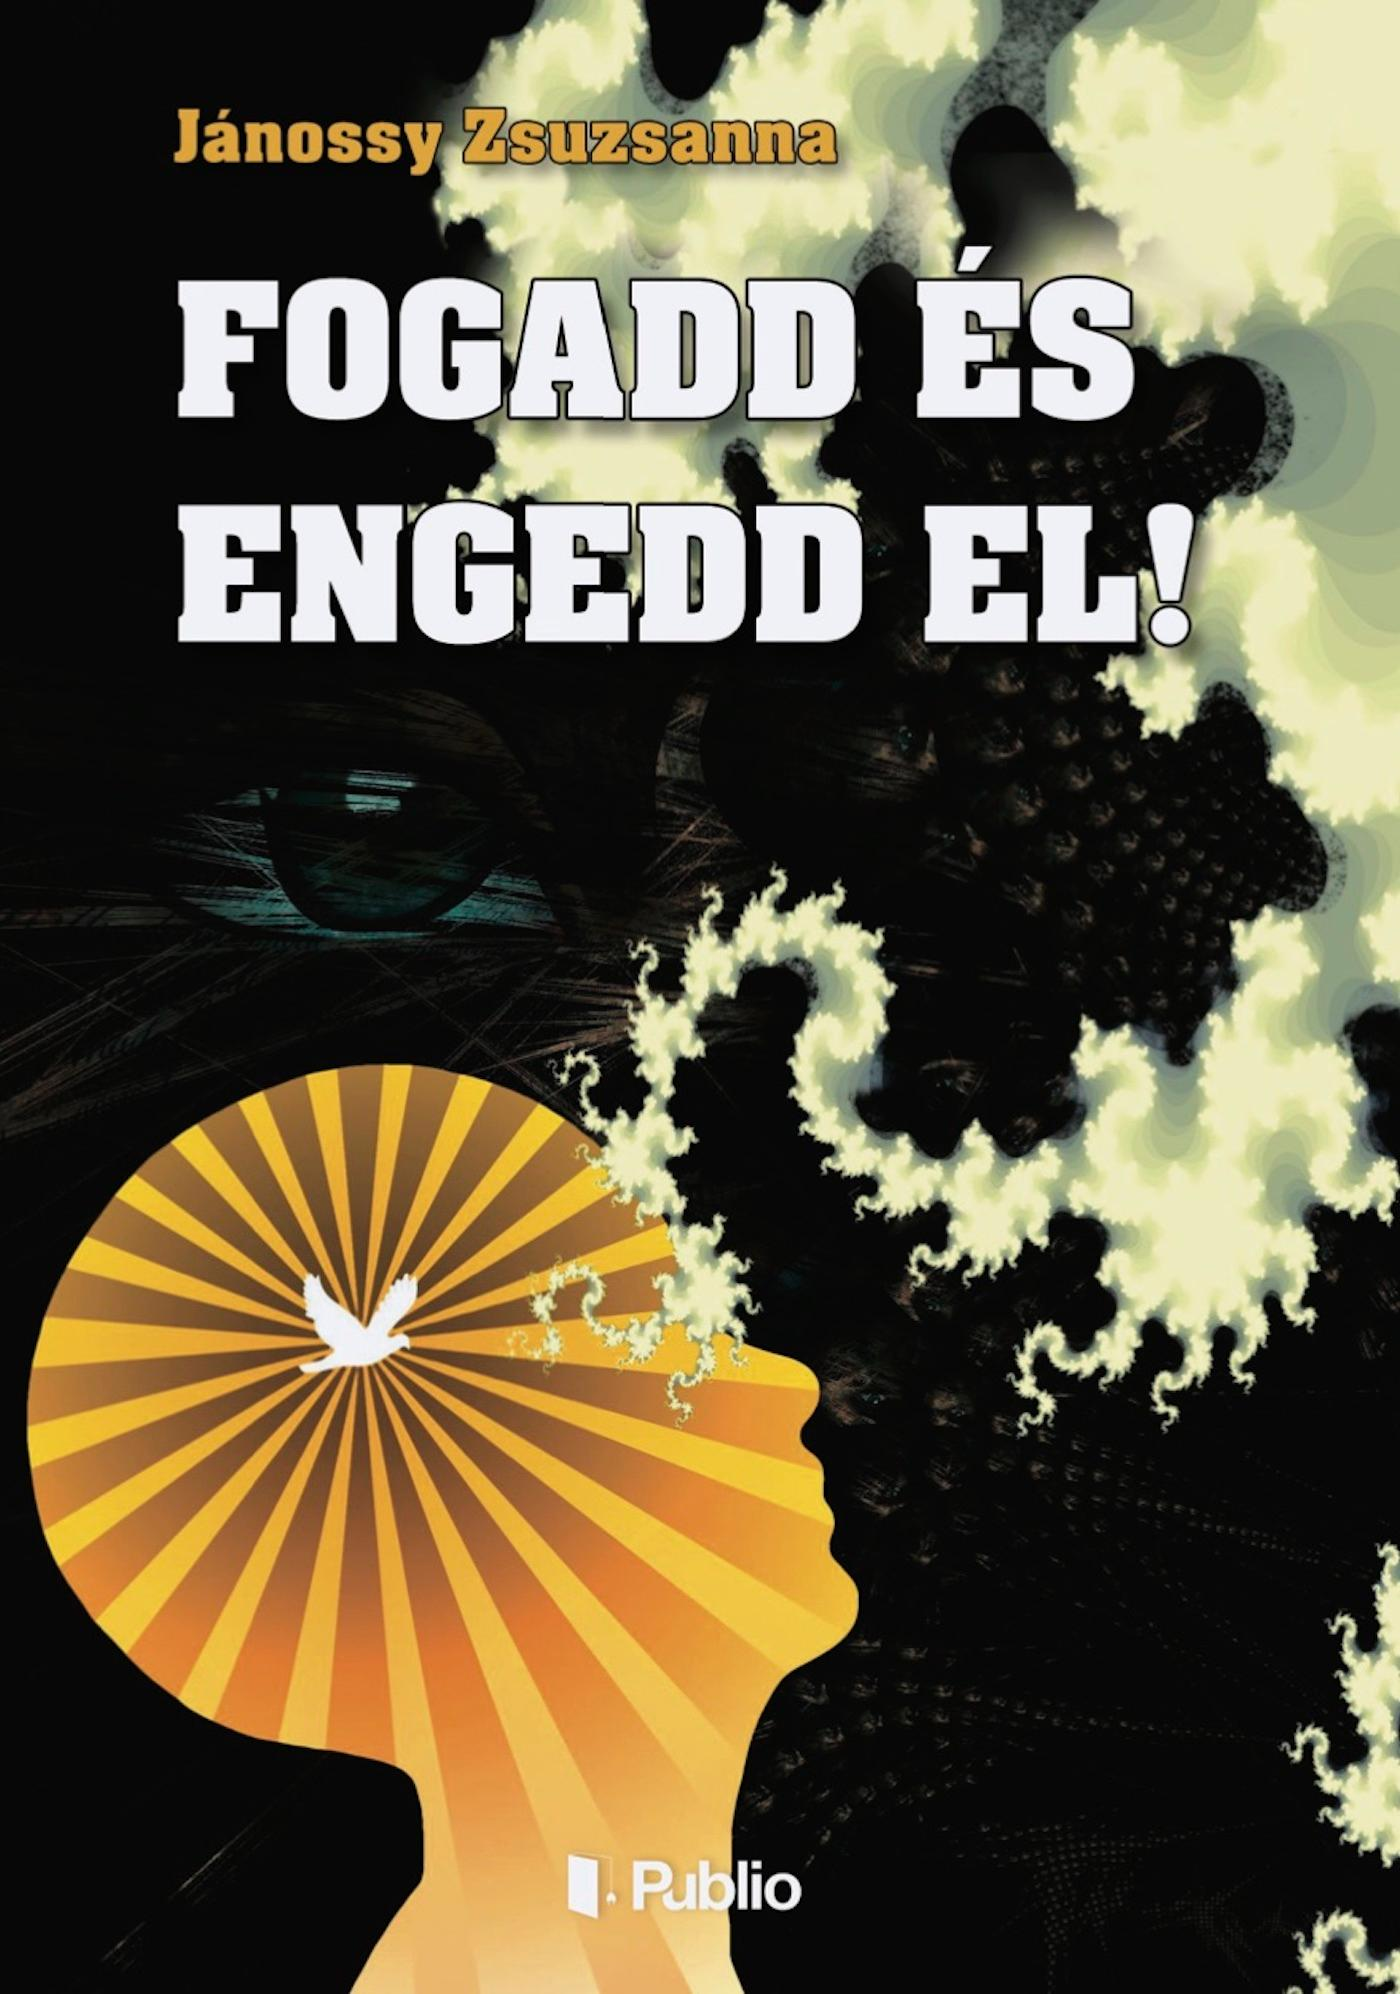 FOGADD ÉS ENGEDD EL!